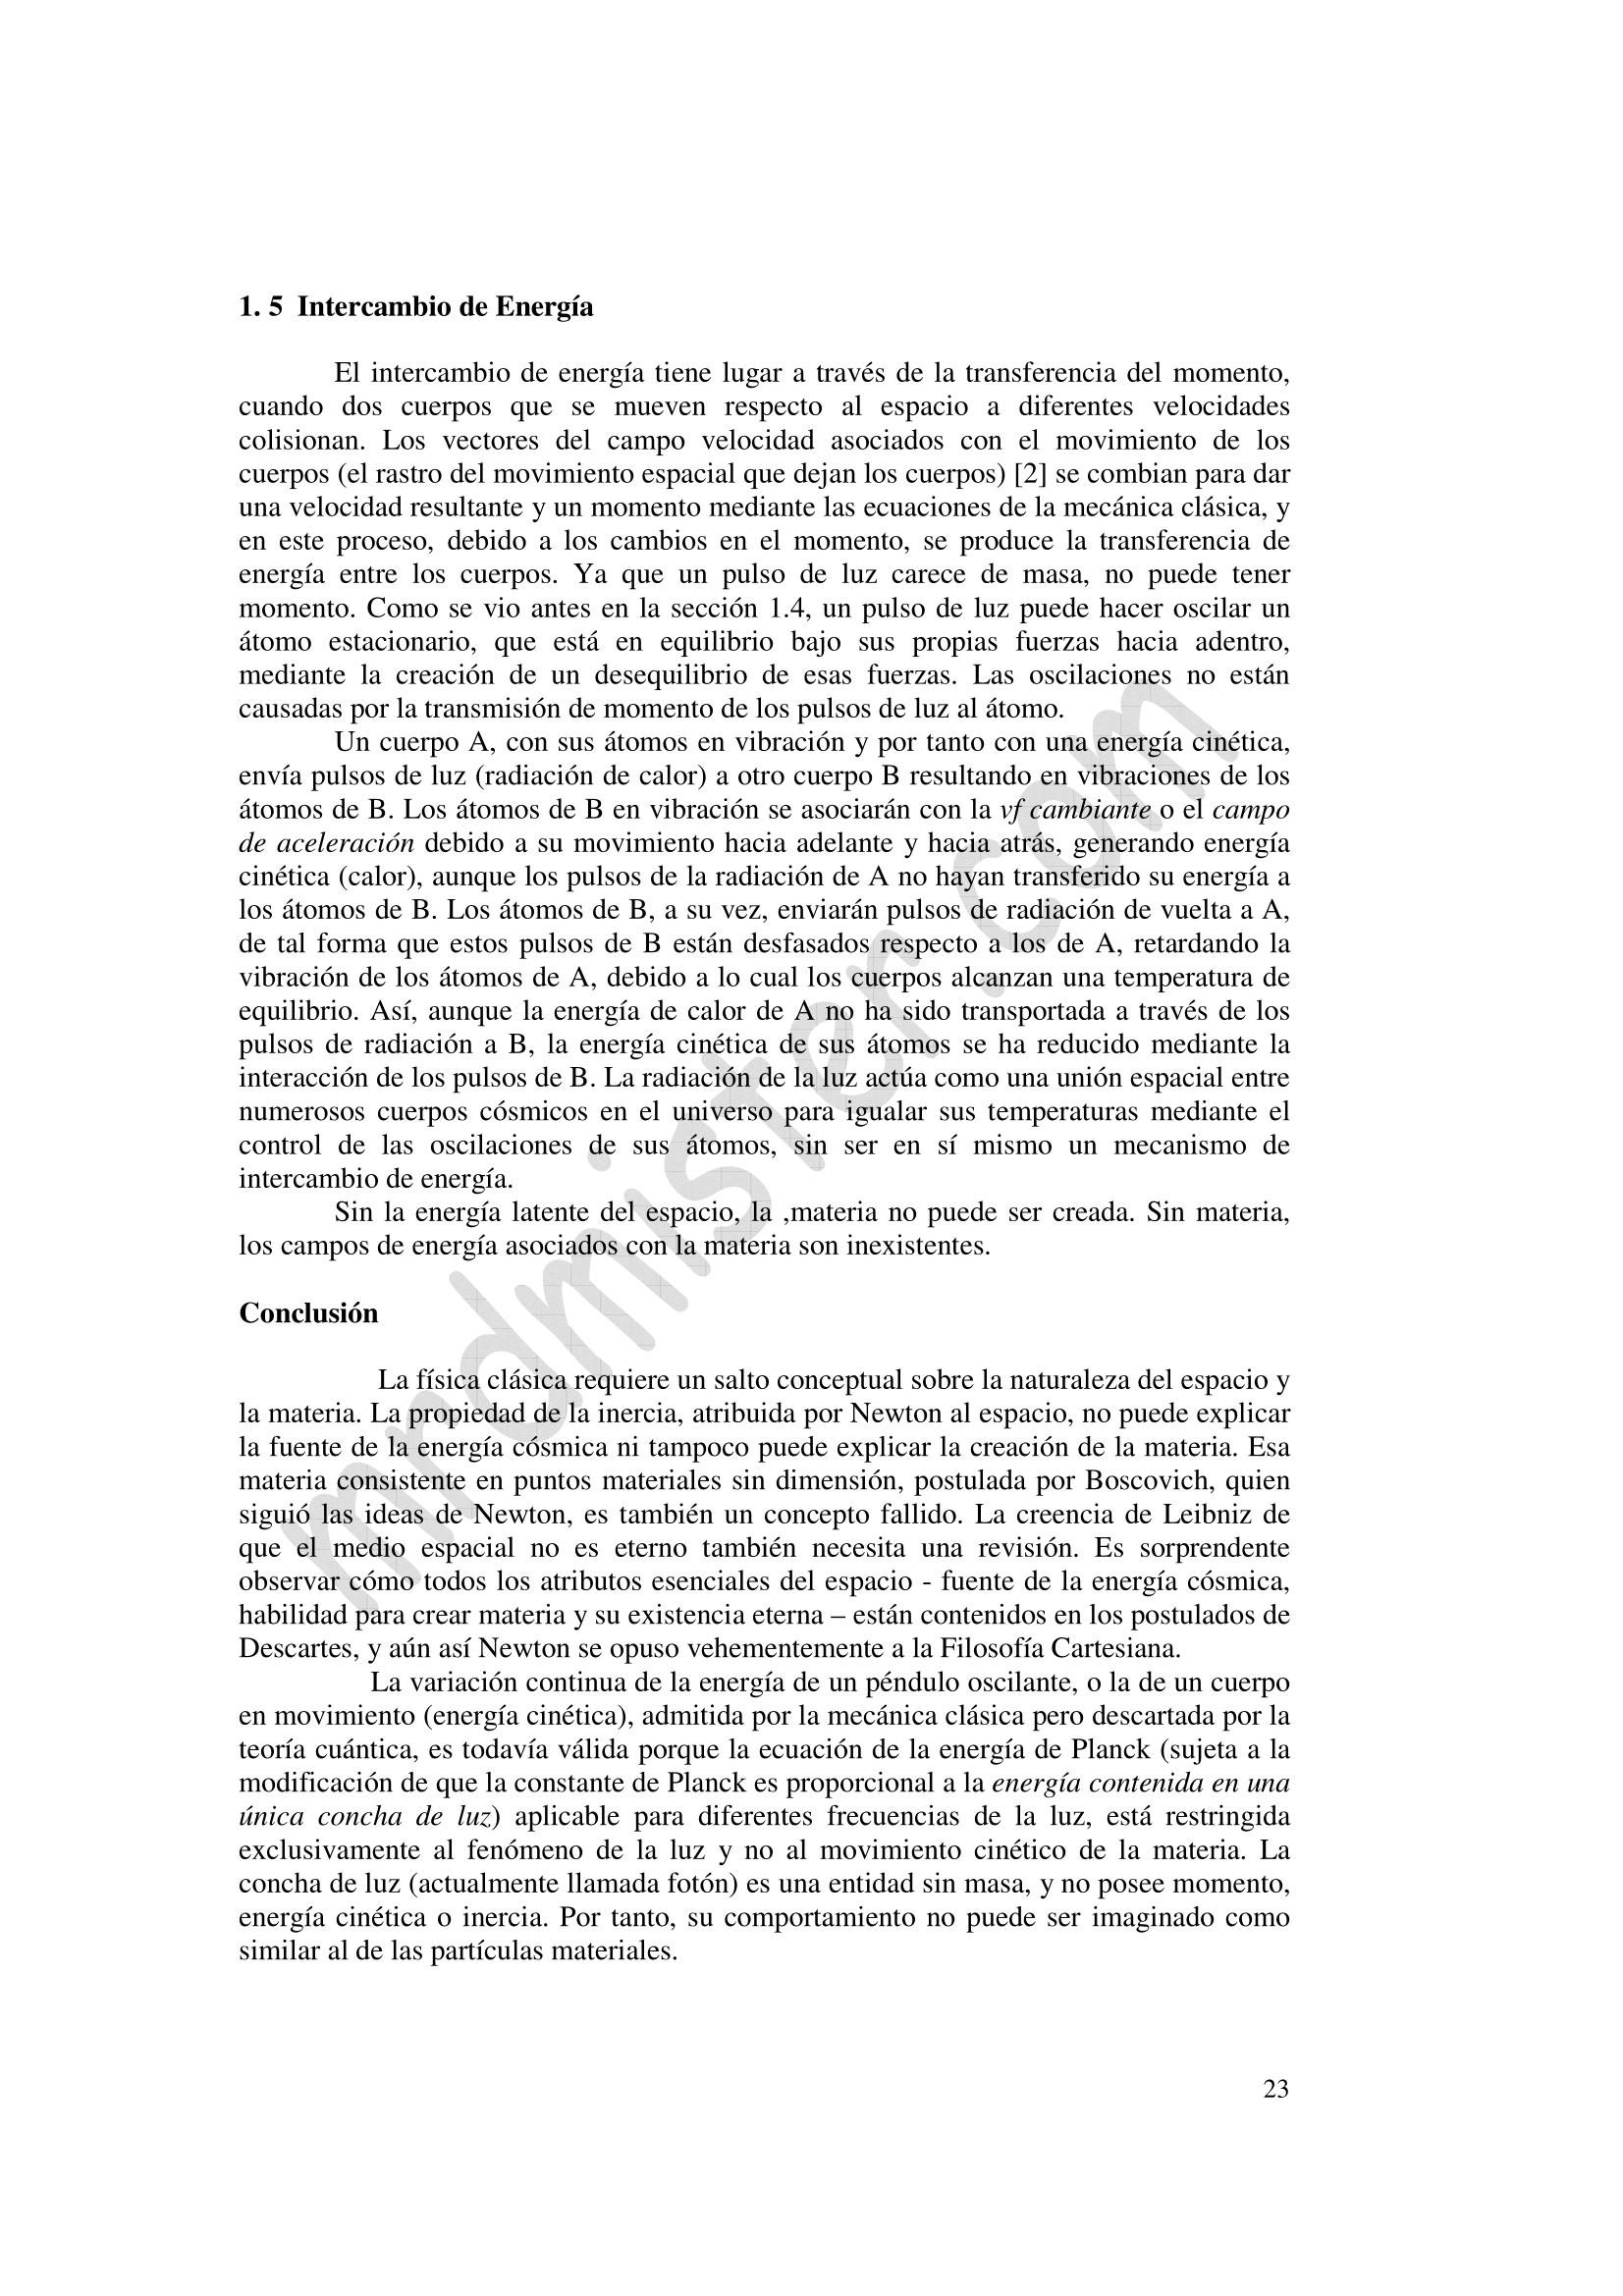 Documento3_Tewari_Espanol_2_con dibujos-23